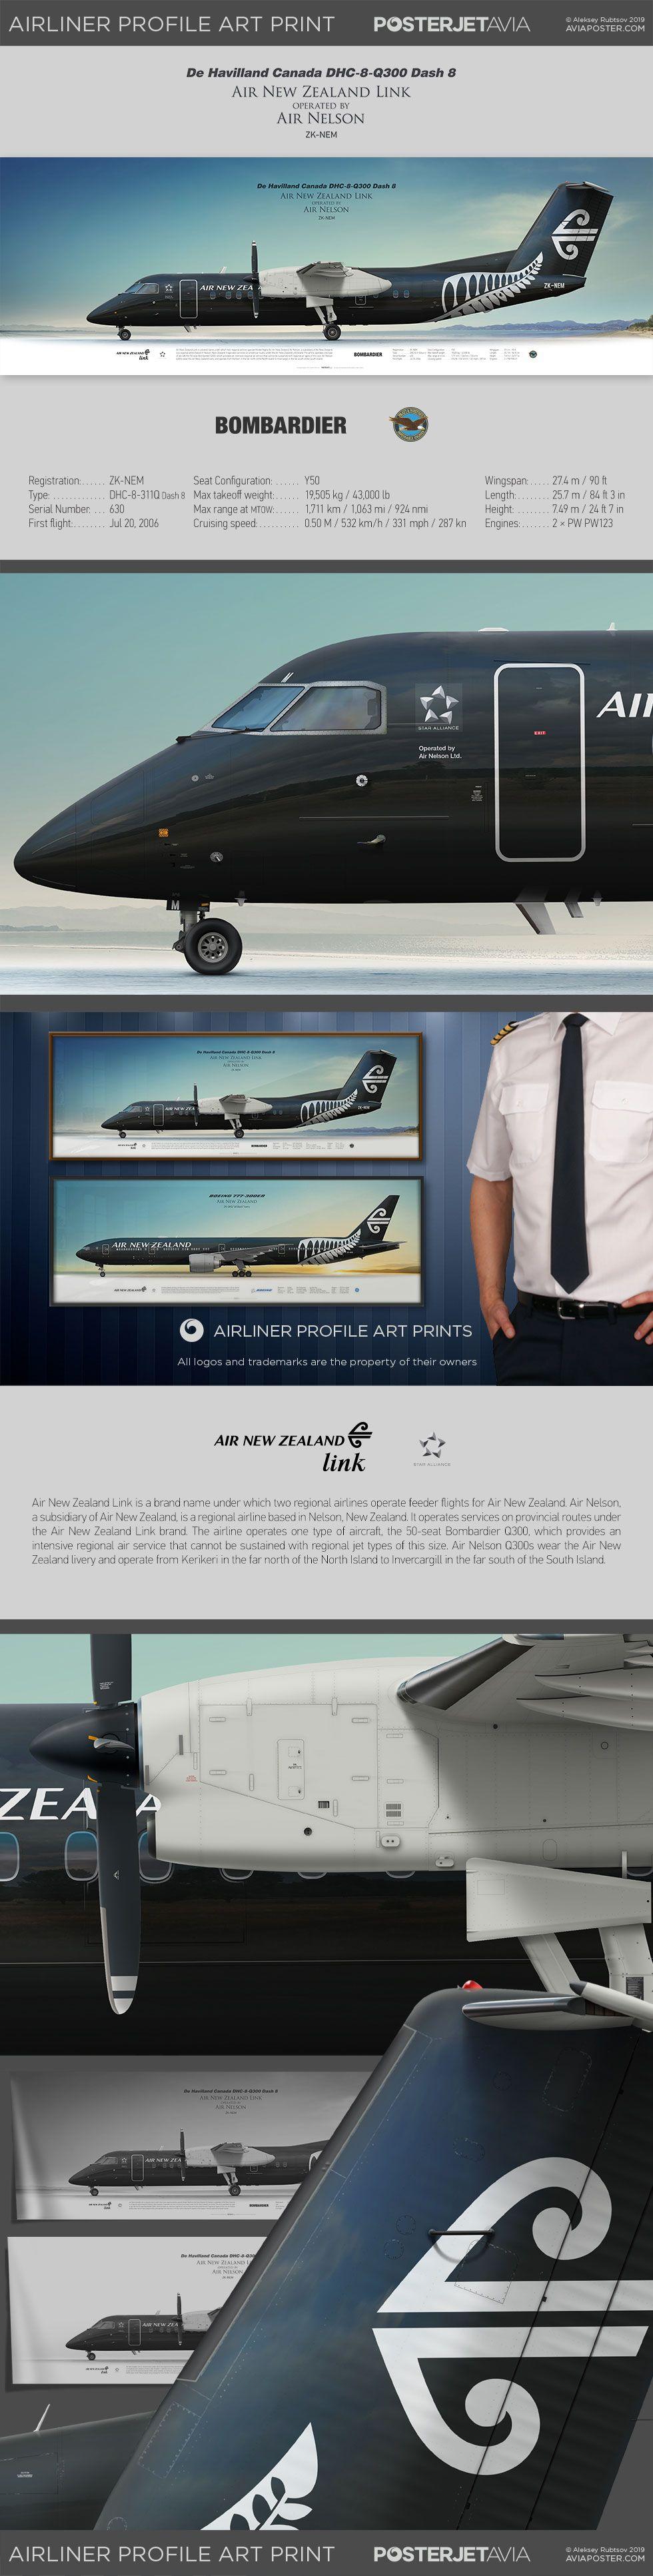 De Havilland Canada DHC-8-Q300 Air New Zealand opb Air Nelson | Airliner Profile Art Prints | #posterjetavia #aviation #aviationlovers #airplanes #planes #avgeek #airlineposter #pilotlife #pilots #instaplane #worldofaviation #instaaviation #profileprints